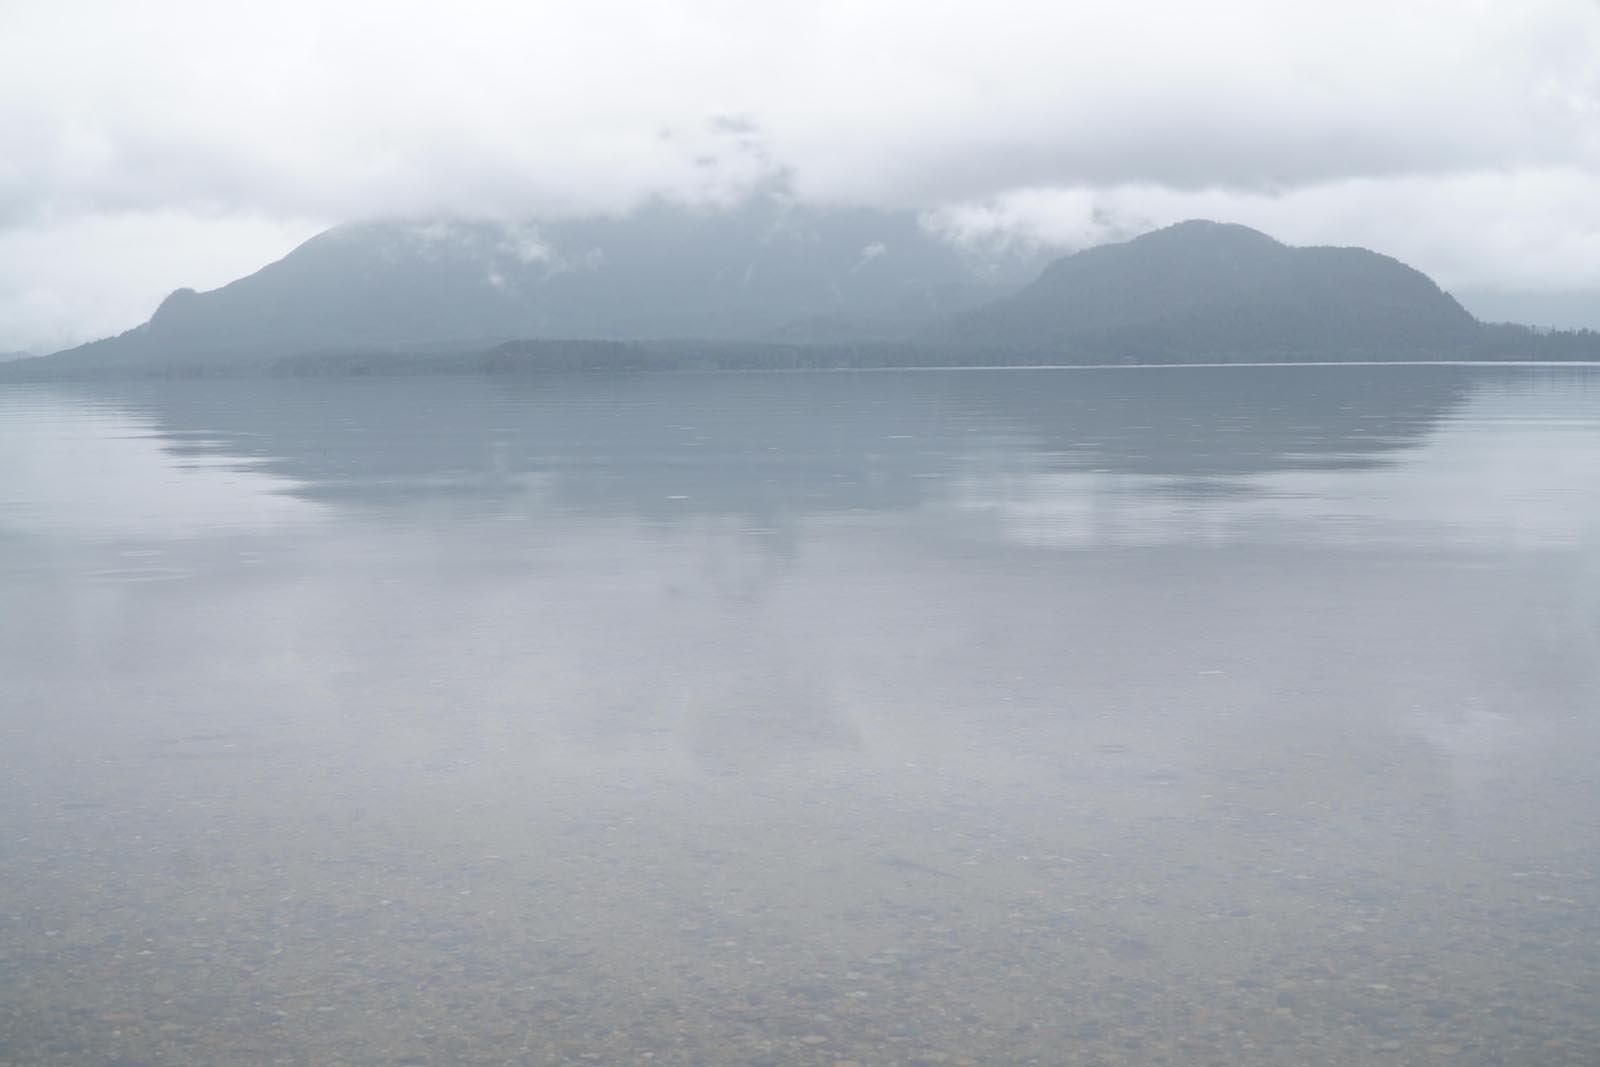 Po ulewnym deszczu Vancouver Island